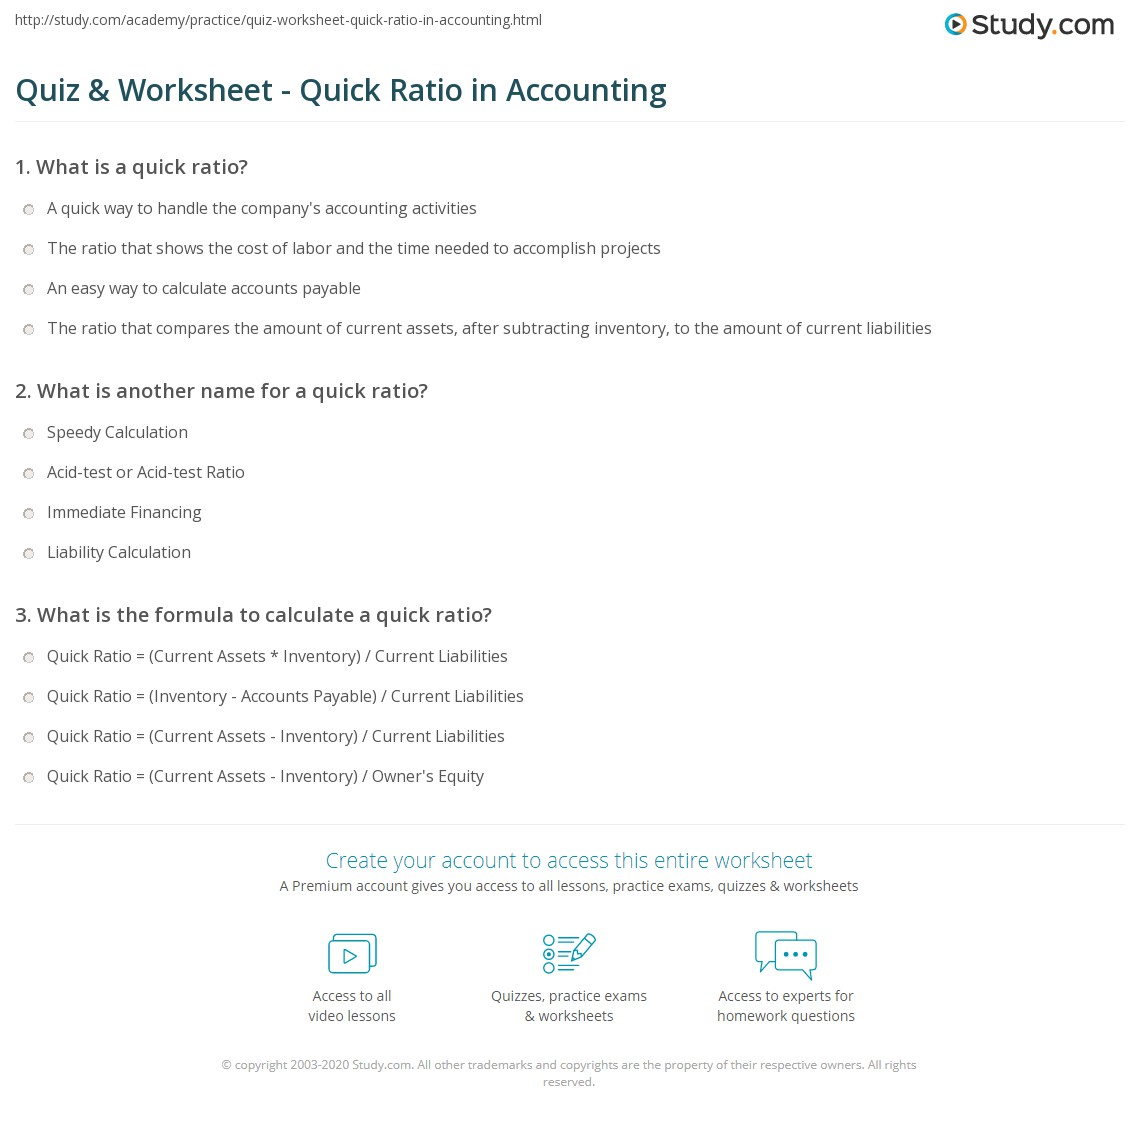 Quiz & Worksheet - Quick Ratio in Accounting | Study.com